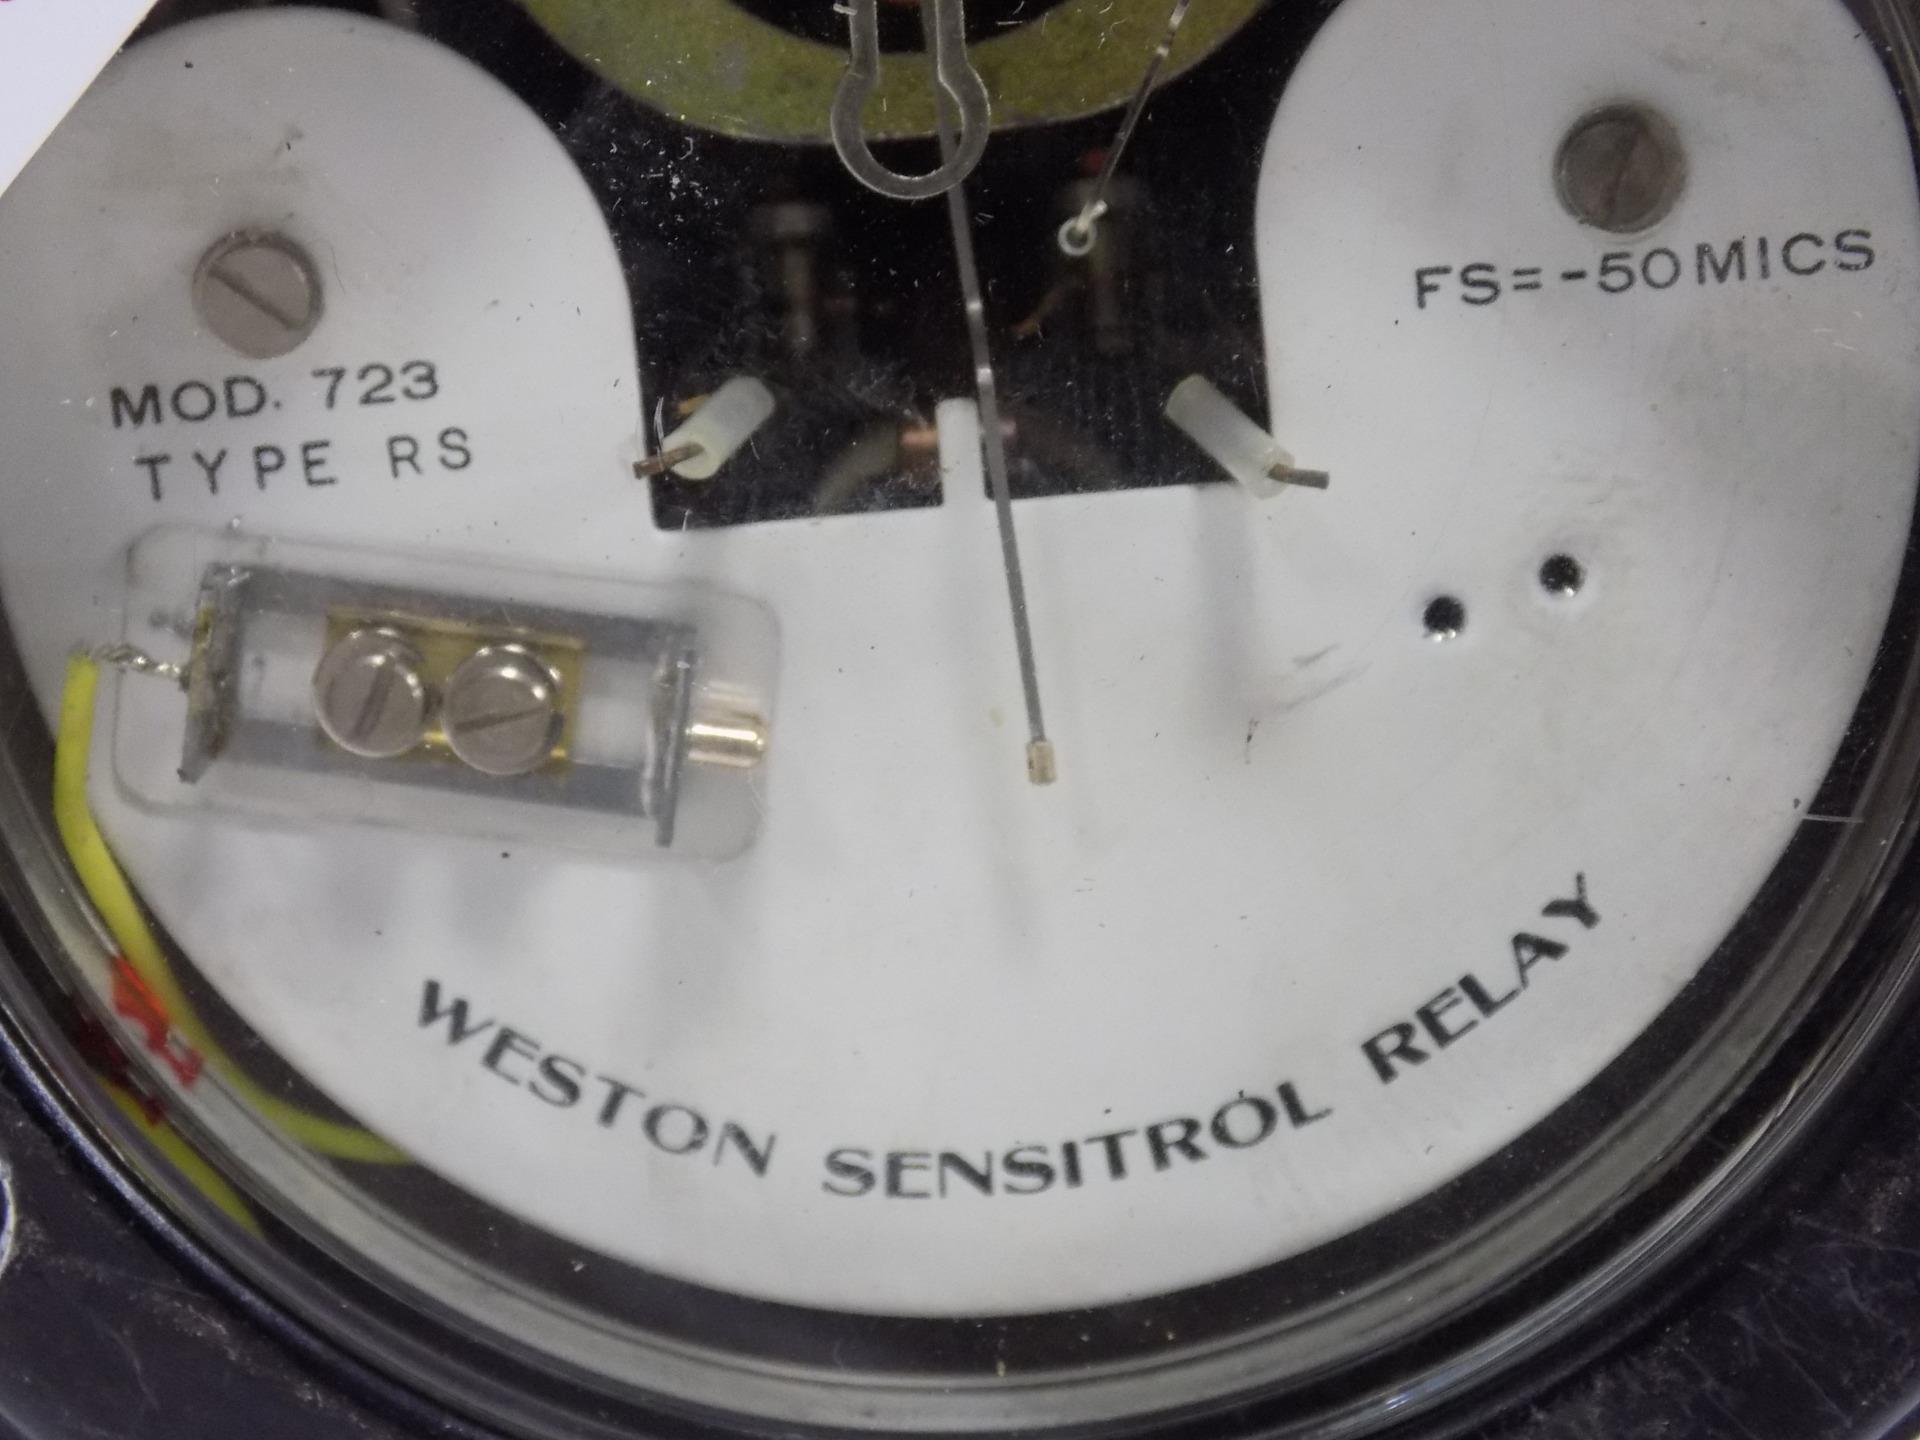 WESTON SENSITROL RELAY MOD 723